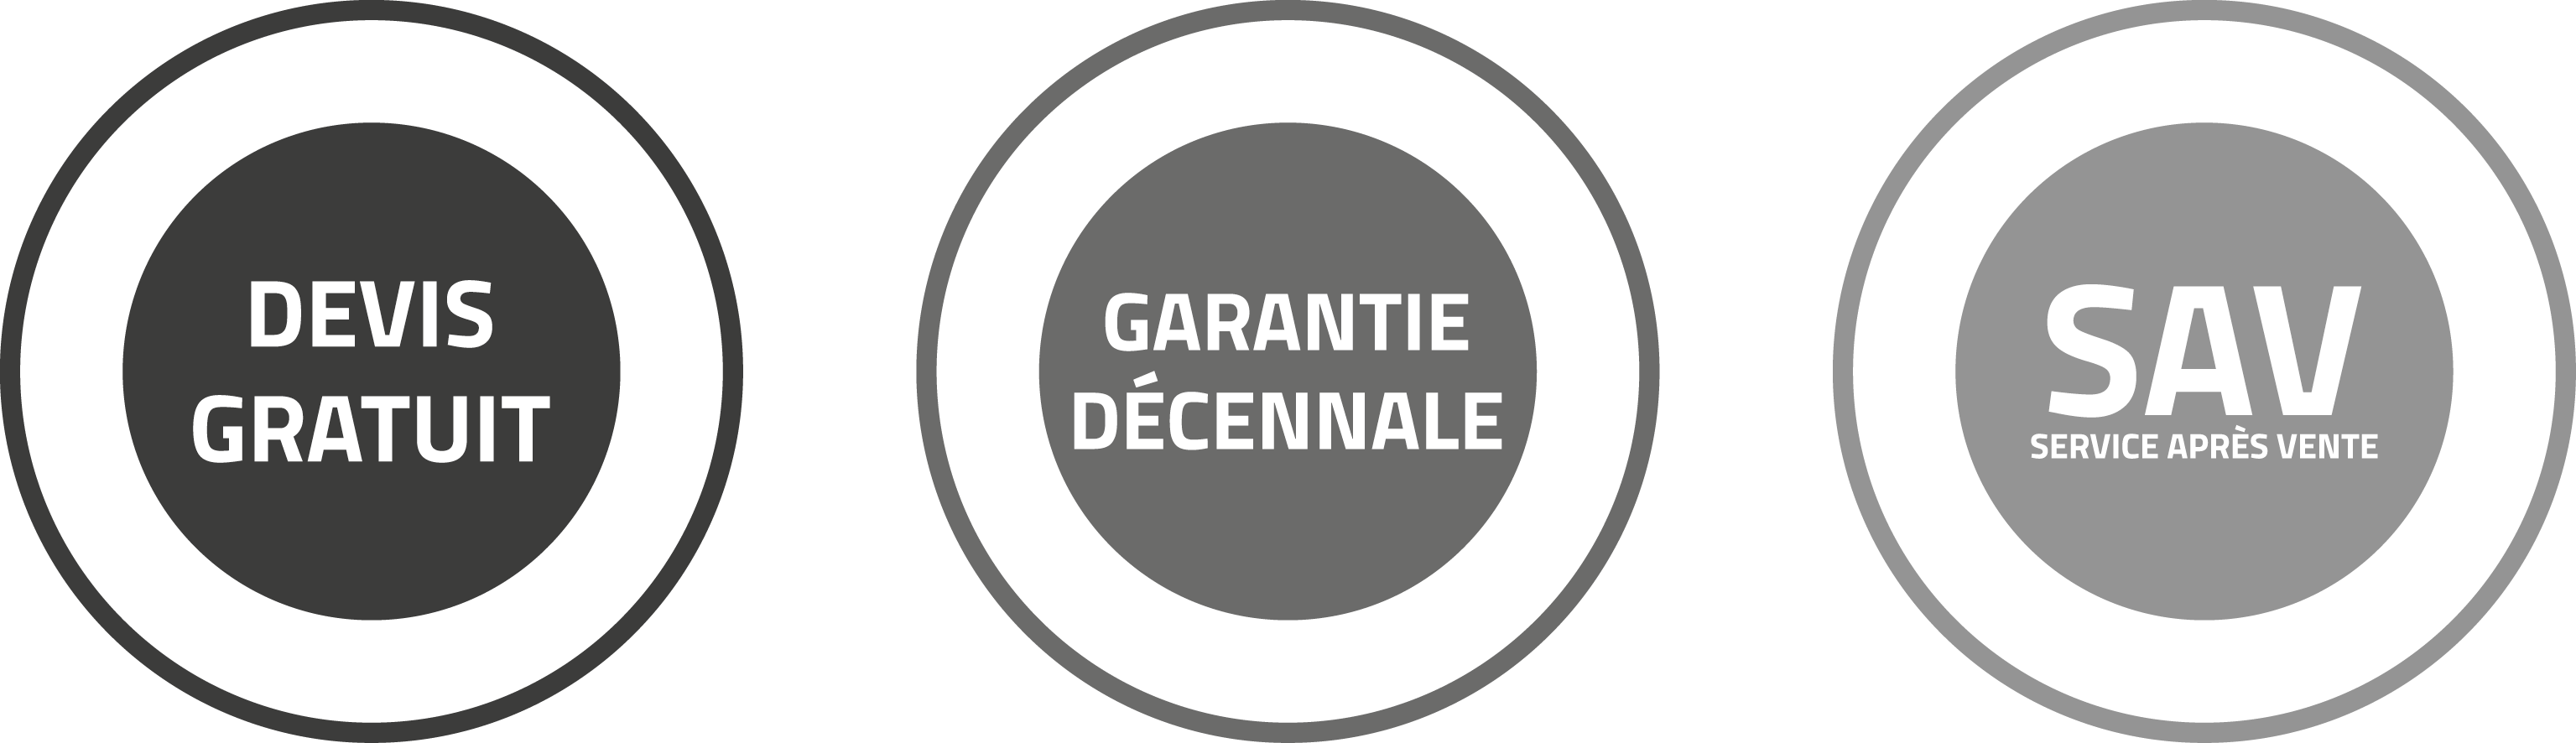 devis-gratuit-sav-garantie-decennale-morin-construction-bois